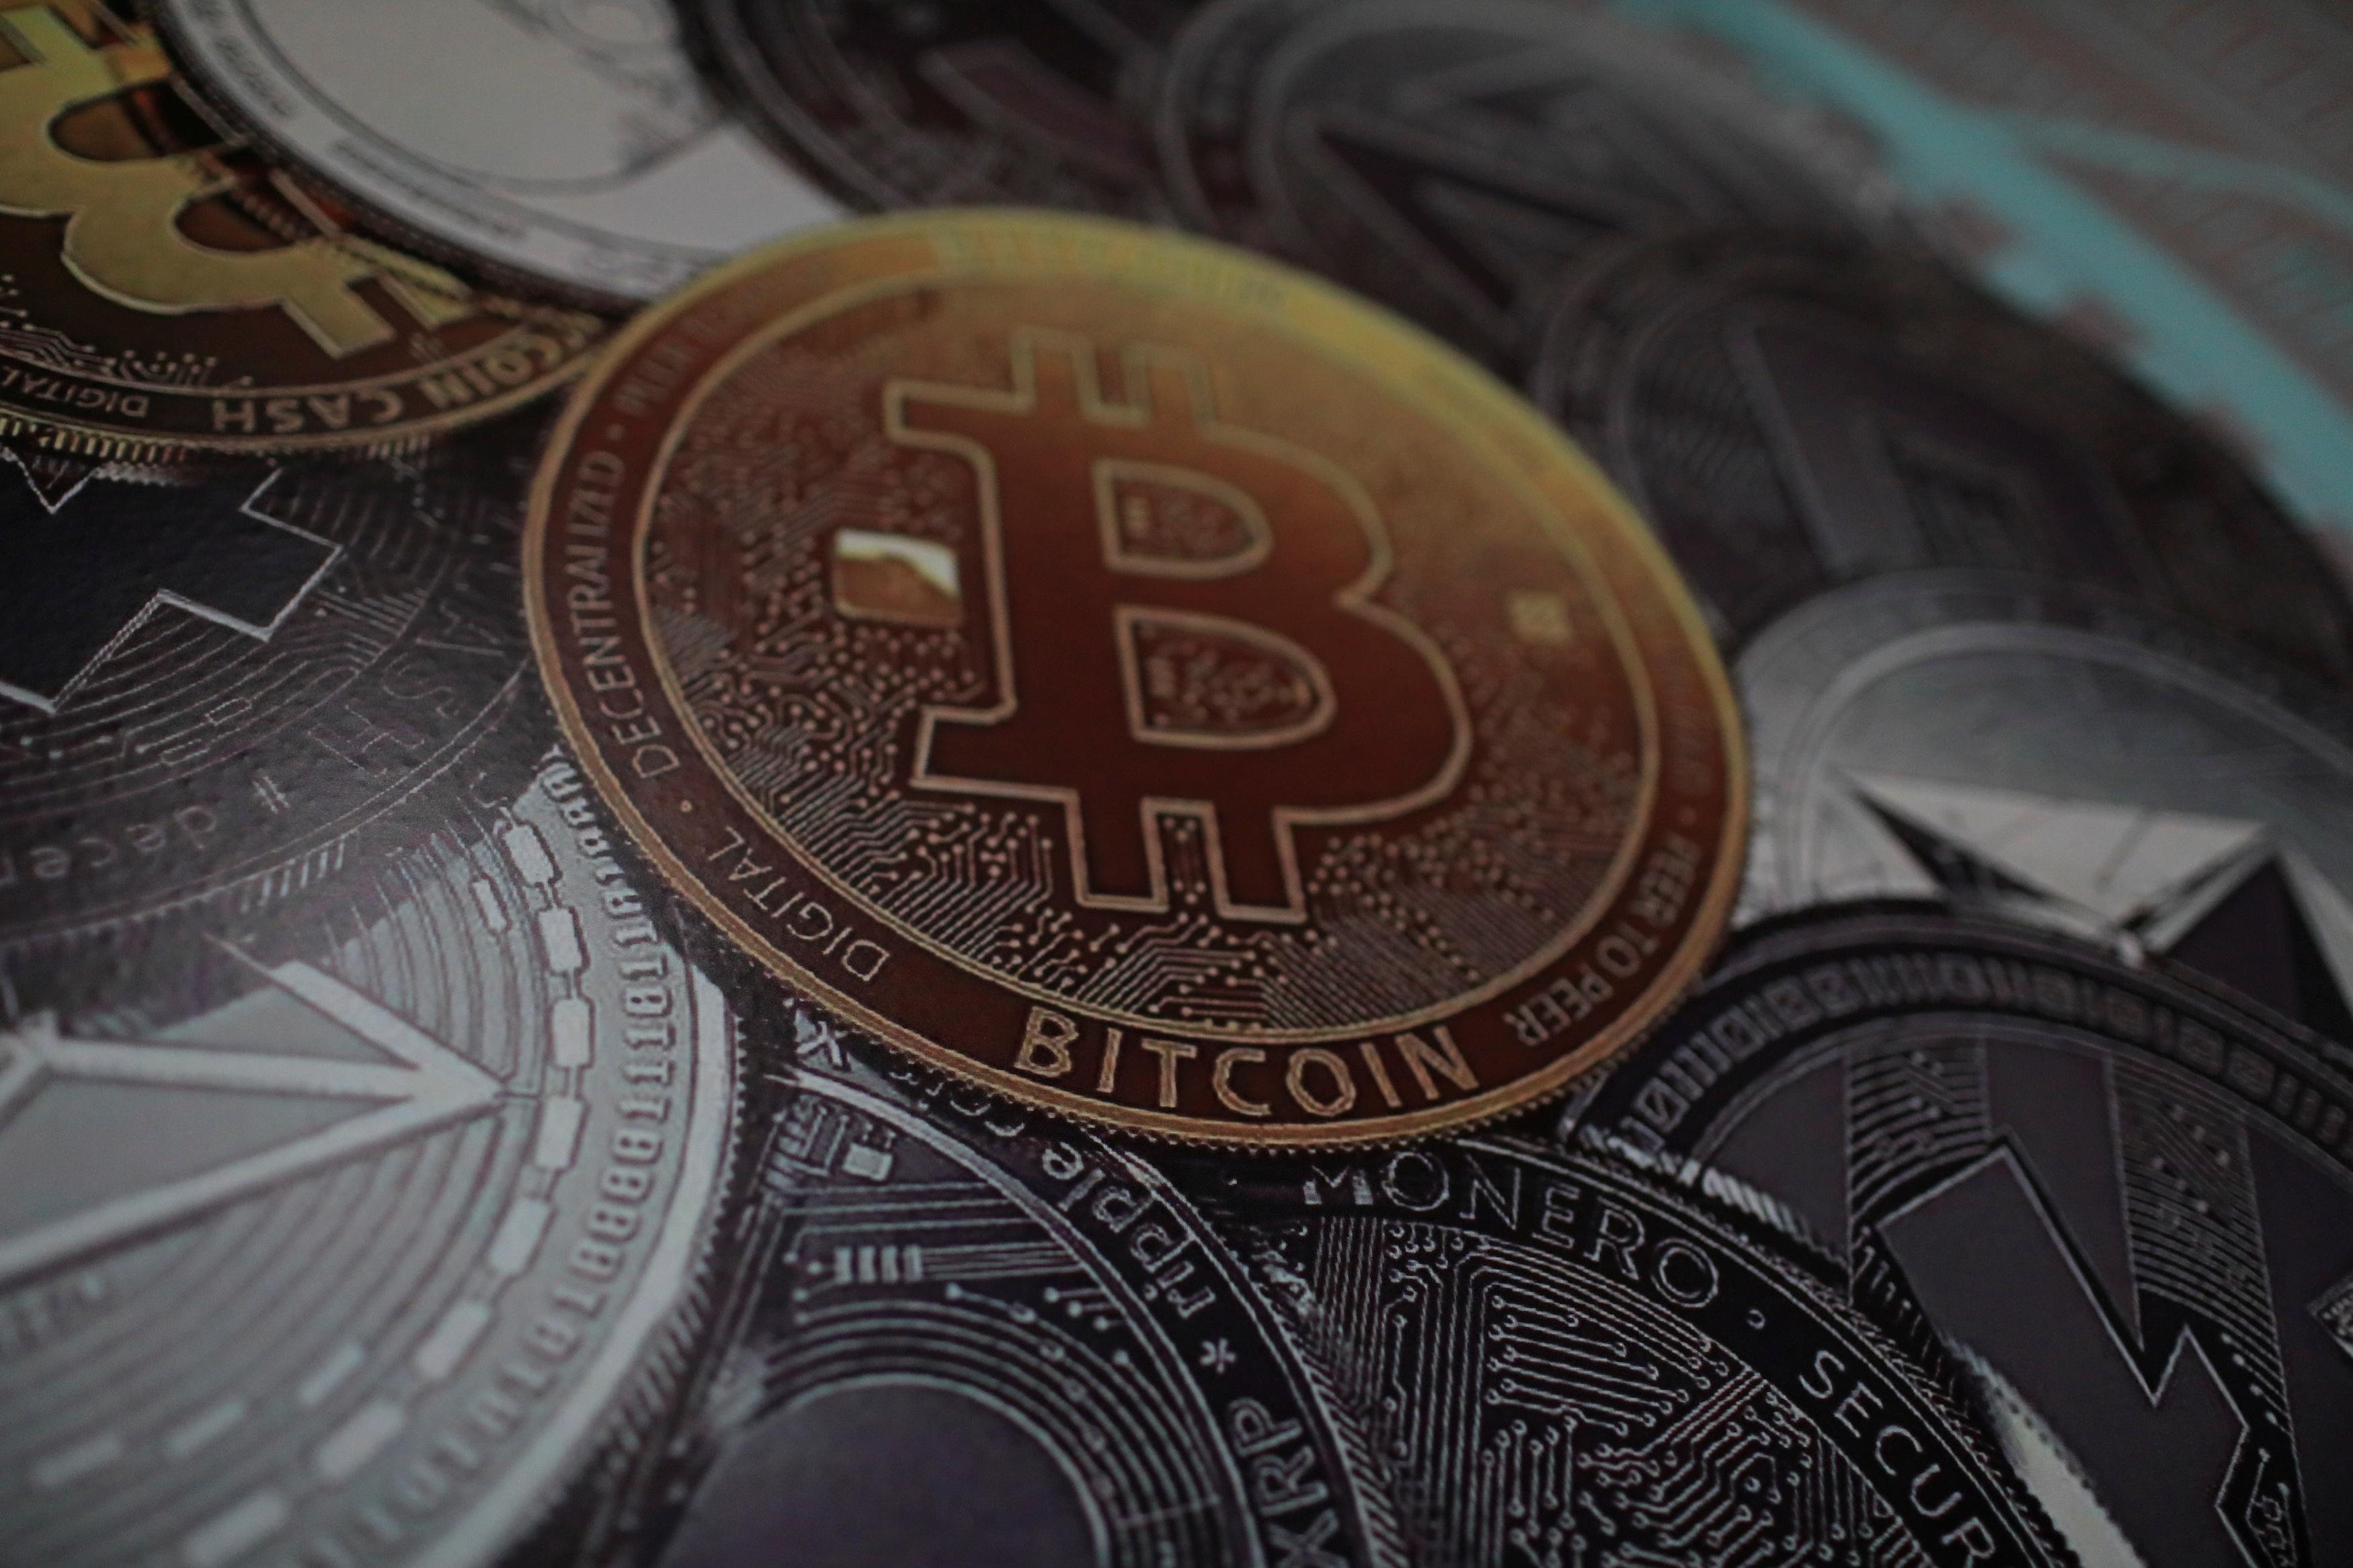 Digital currencies: Five big implications for central banks